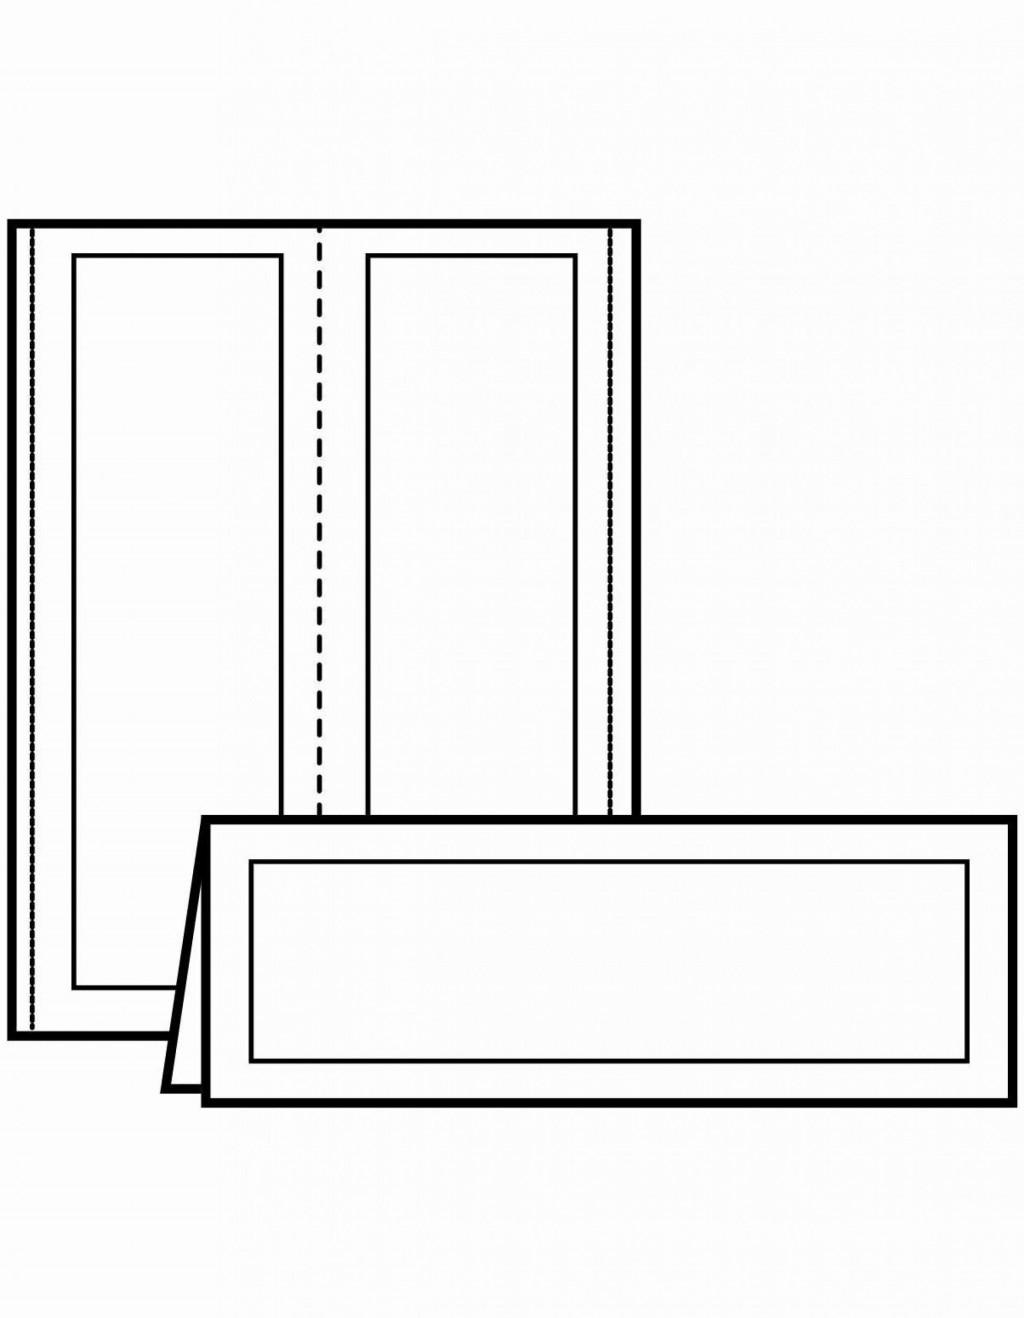 009 Beautiful Free Printable Card Template Word Idea  Blank Busines ForLarge